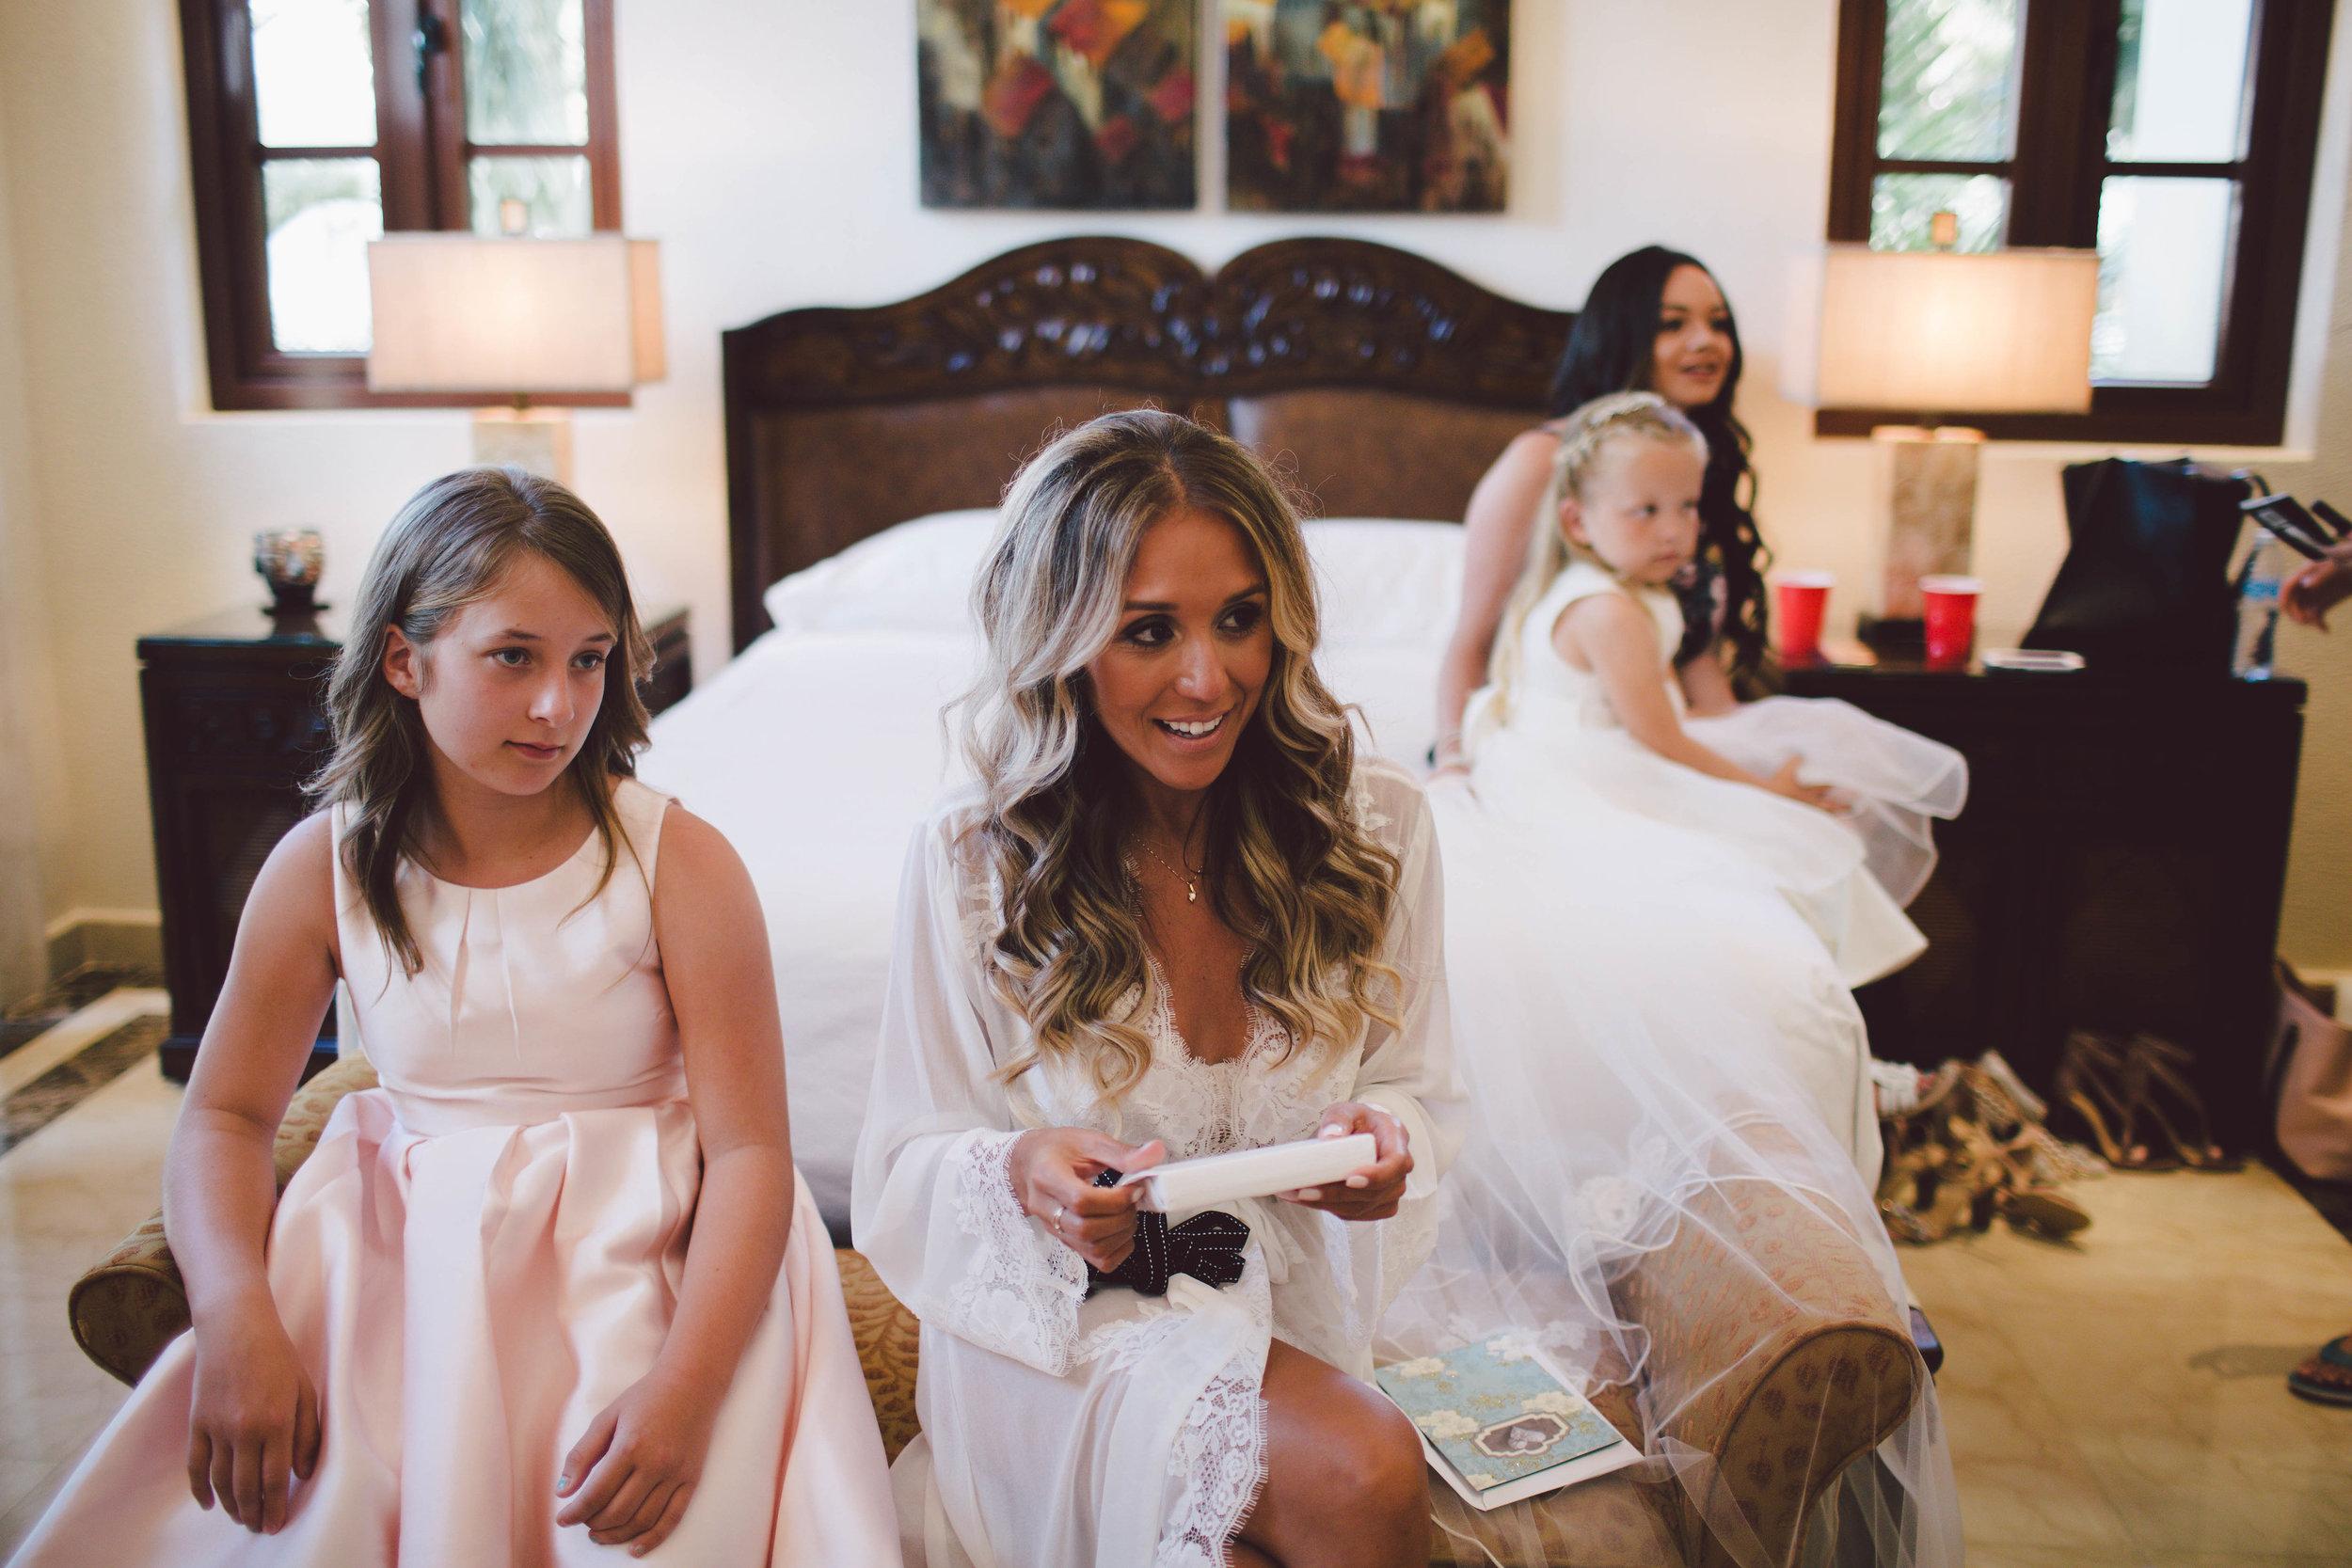 mexico_wedding_cancun_villa_la_joya_evangeline_lane_014.jpg